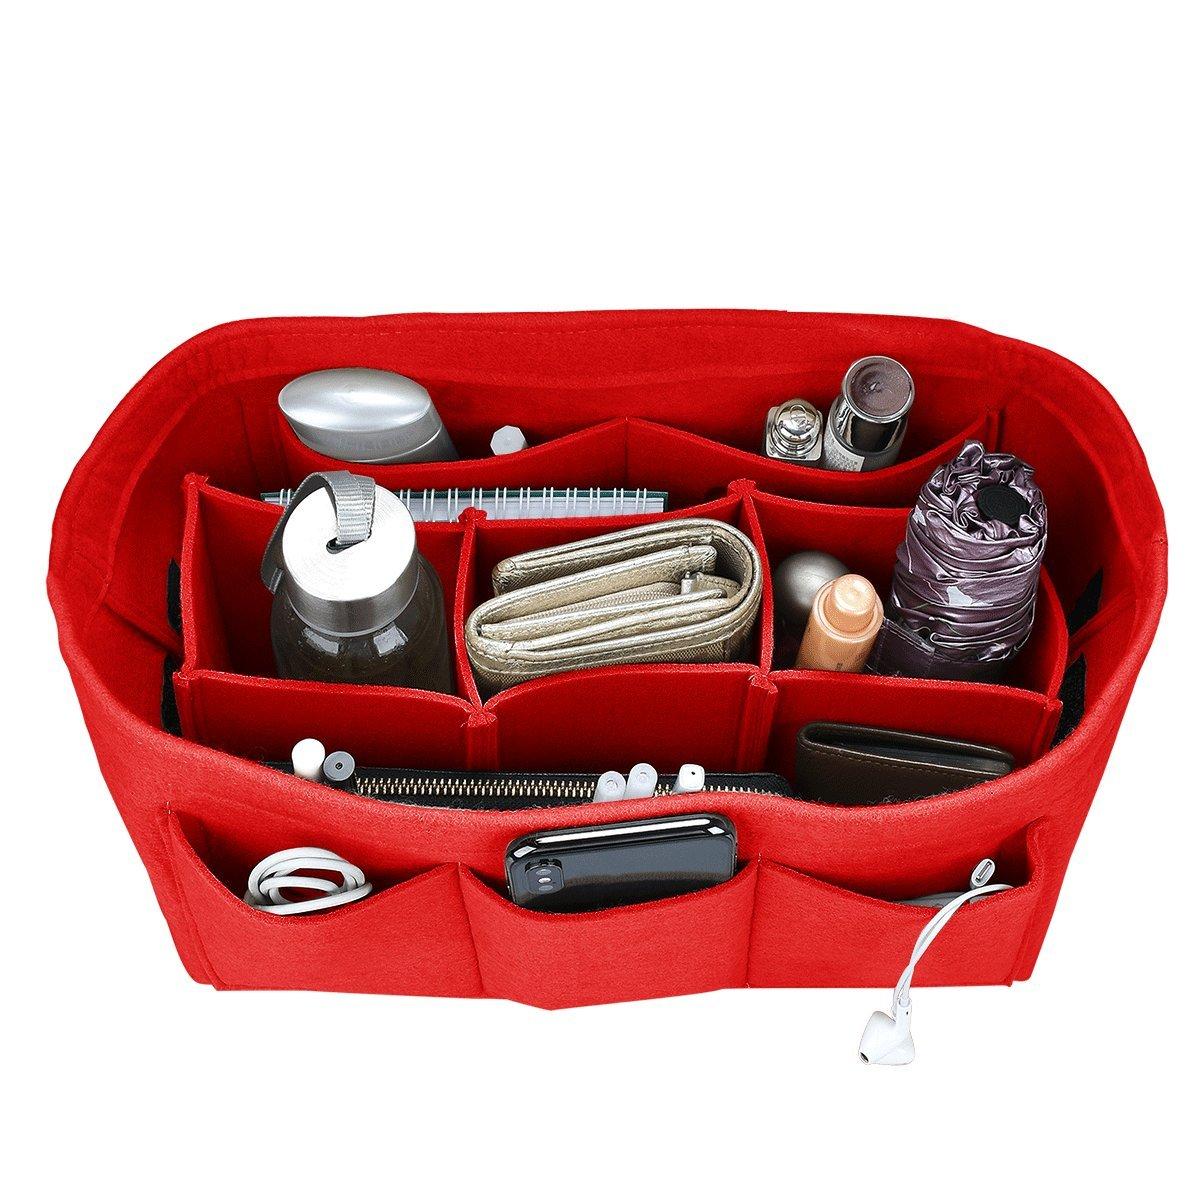 Felt Purse Insert Organizer, Handbag organizer, Bag in Bag for Handbag Purse Tote, Diaper Bag Organizer, Stand on Its Own, 12 Compartments, 3 Sizes (XL, Red)